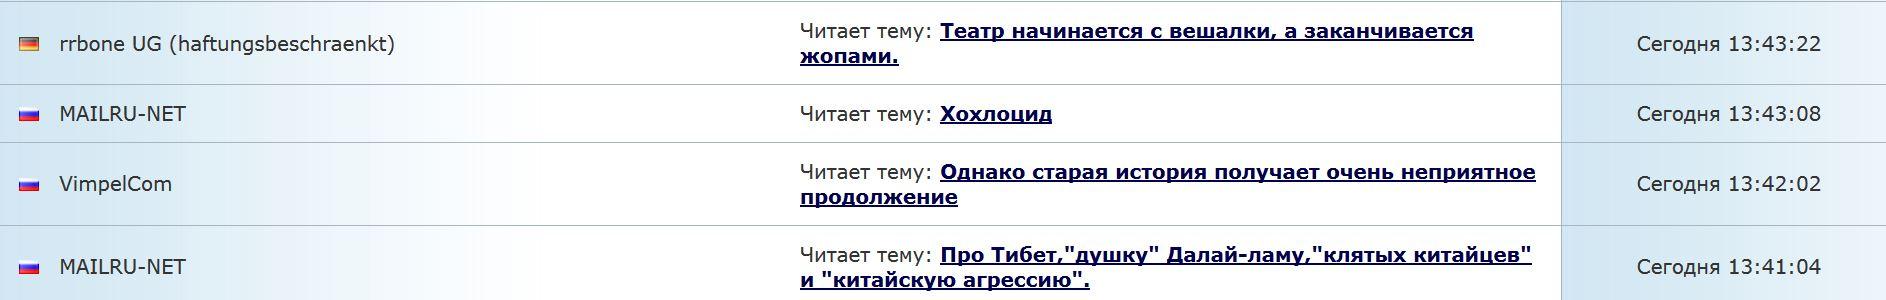 http://s1.uploads.ru/JUPlK.jpg